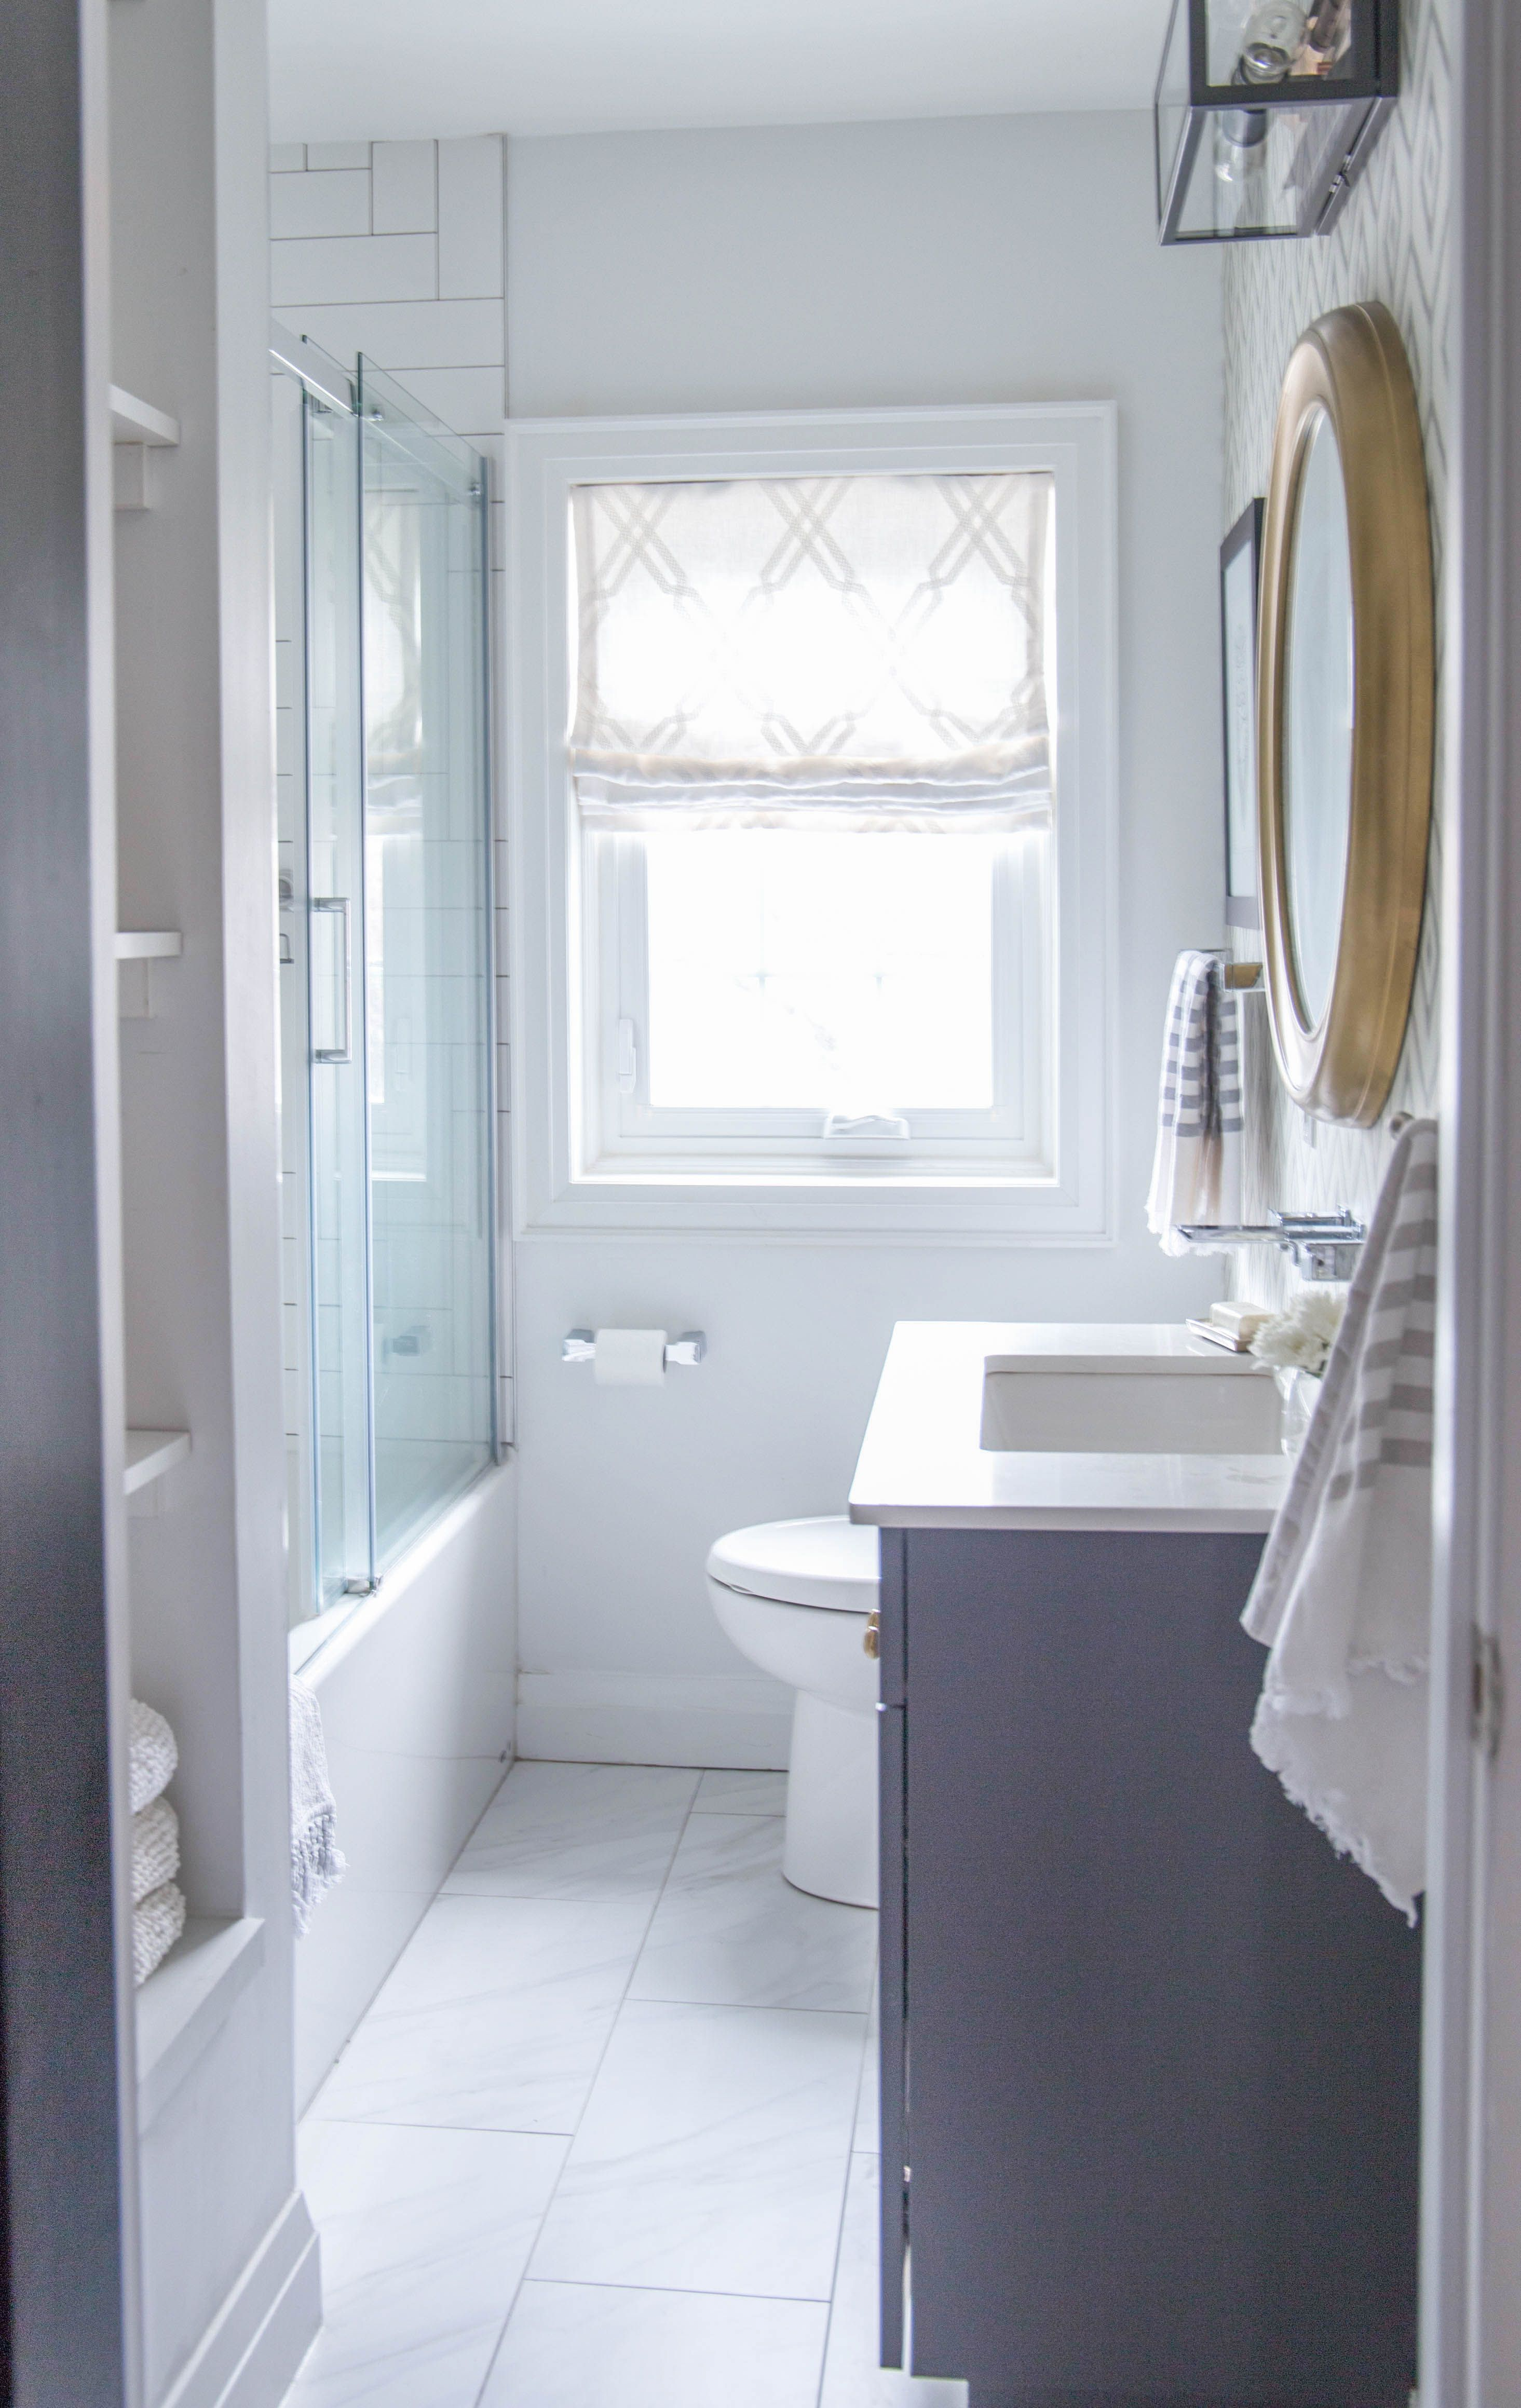 Property Brothers Bathroom Reveal By Karin Bennett Designs Bathroom Brightwhite Clean Simple So Bathrooms Remodel Bathroom Design Bathroom Remodel Master